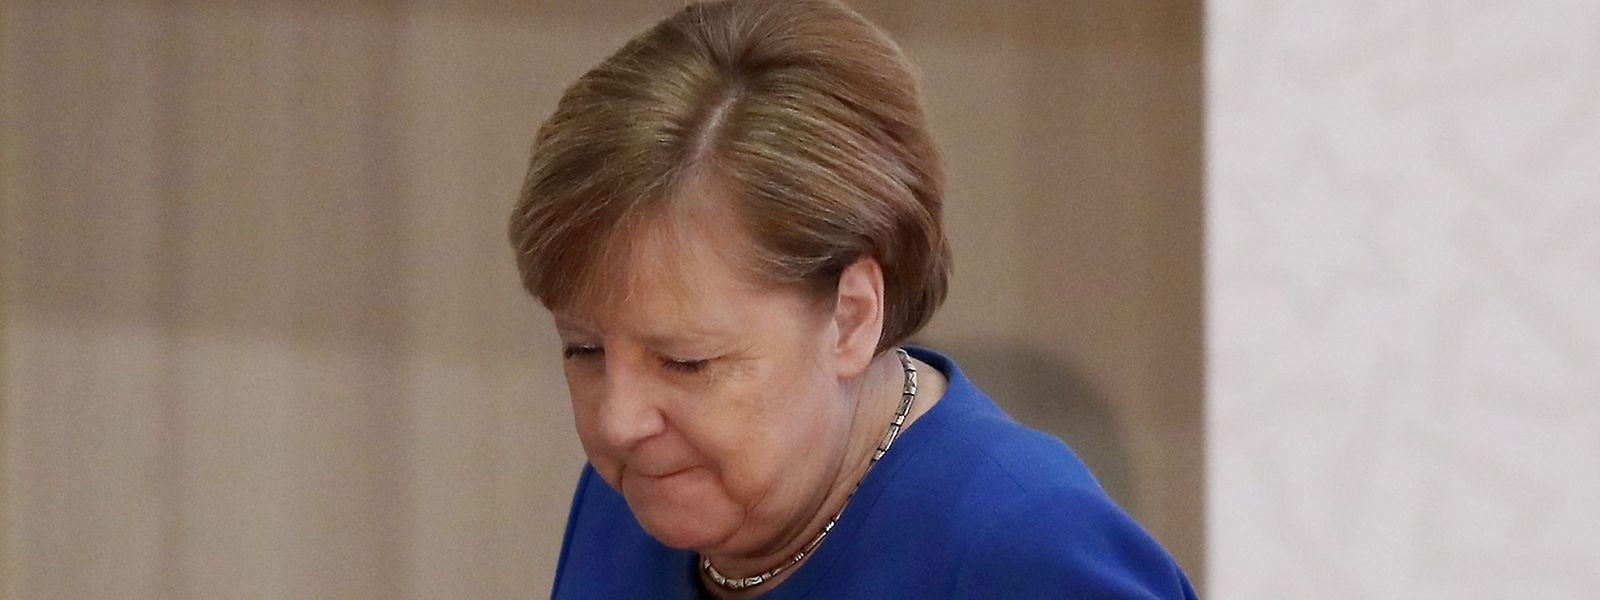 Trotz Kritik hält Angela Merkel am Flüchtlingspakt mit der Türkei fest.